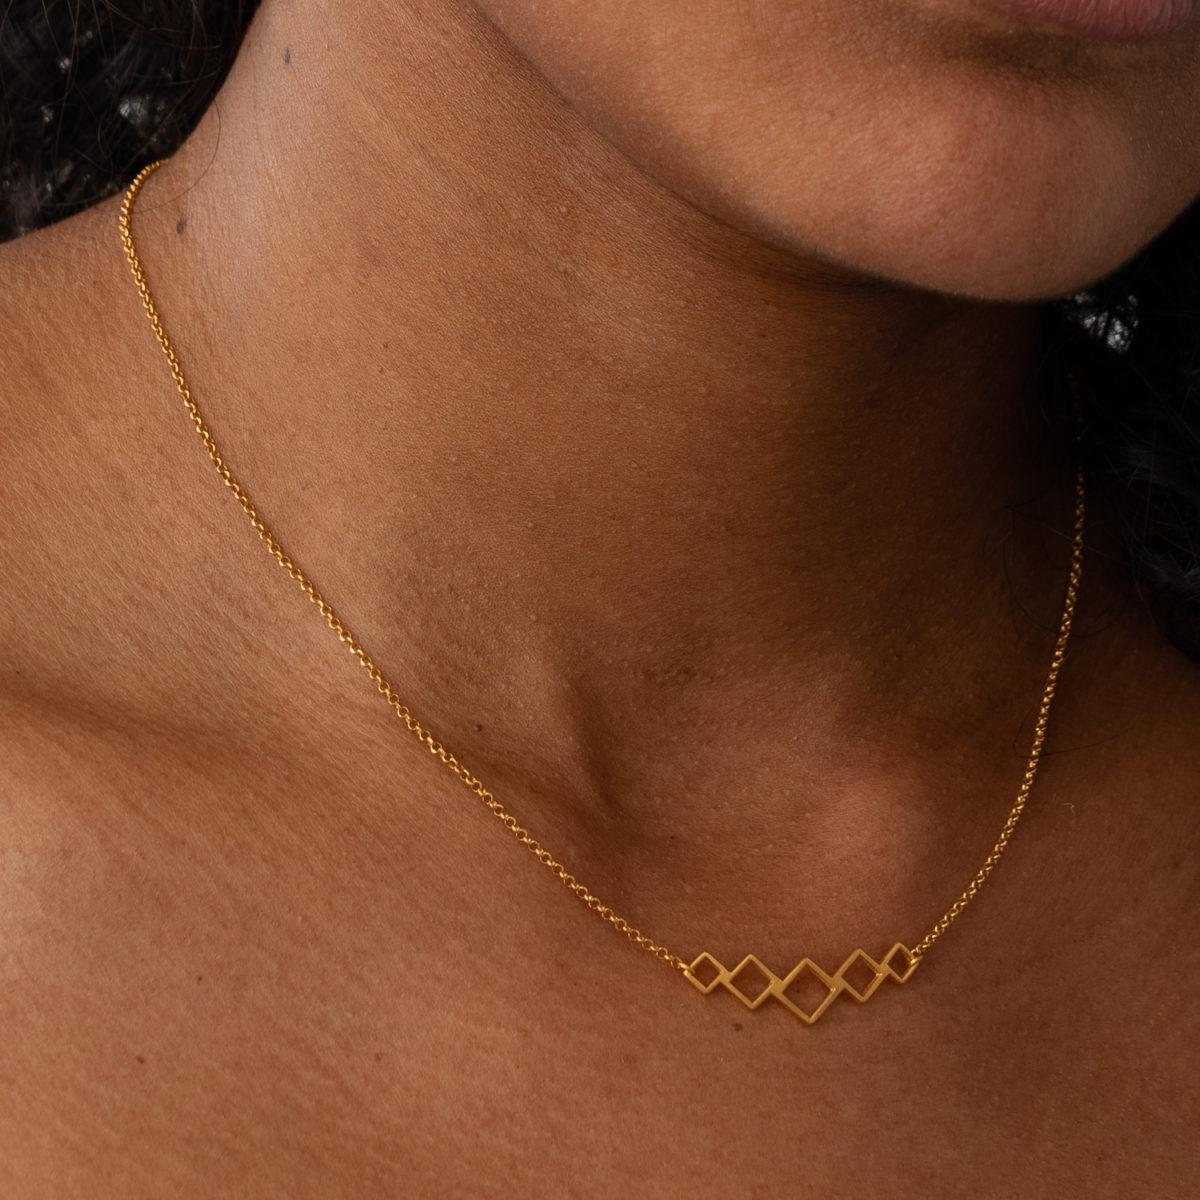 Quadrate Halskette gold geometrisch